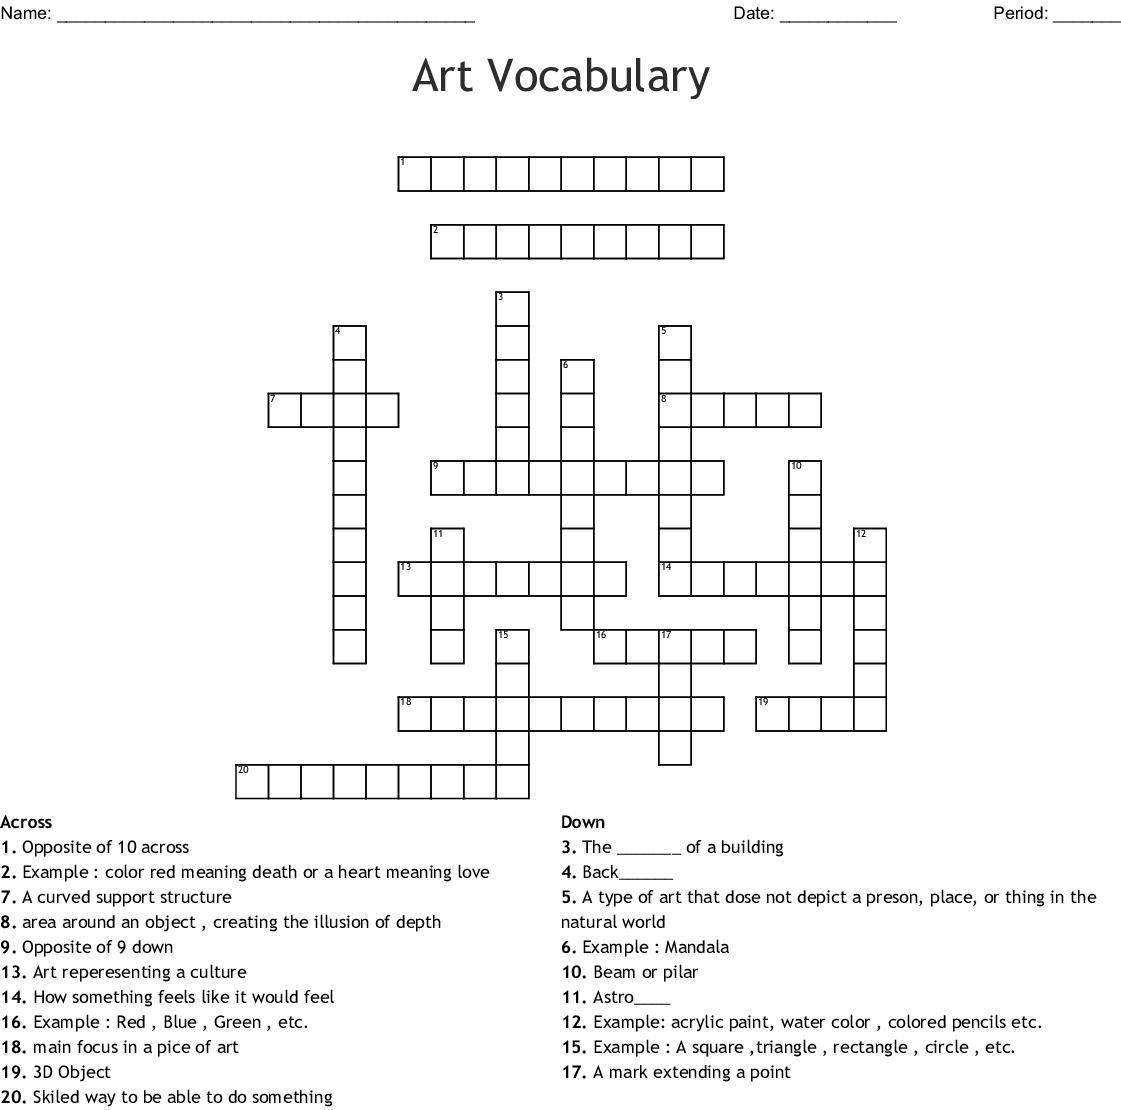 Art Vocabulary Crossword